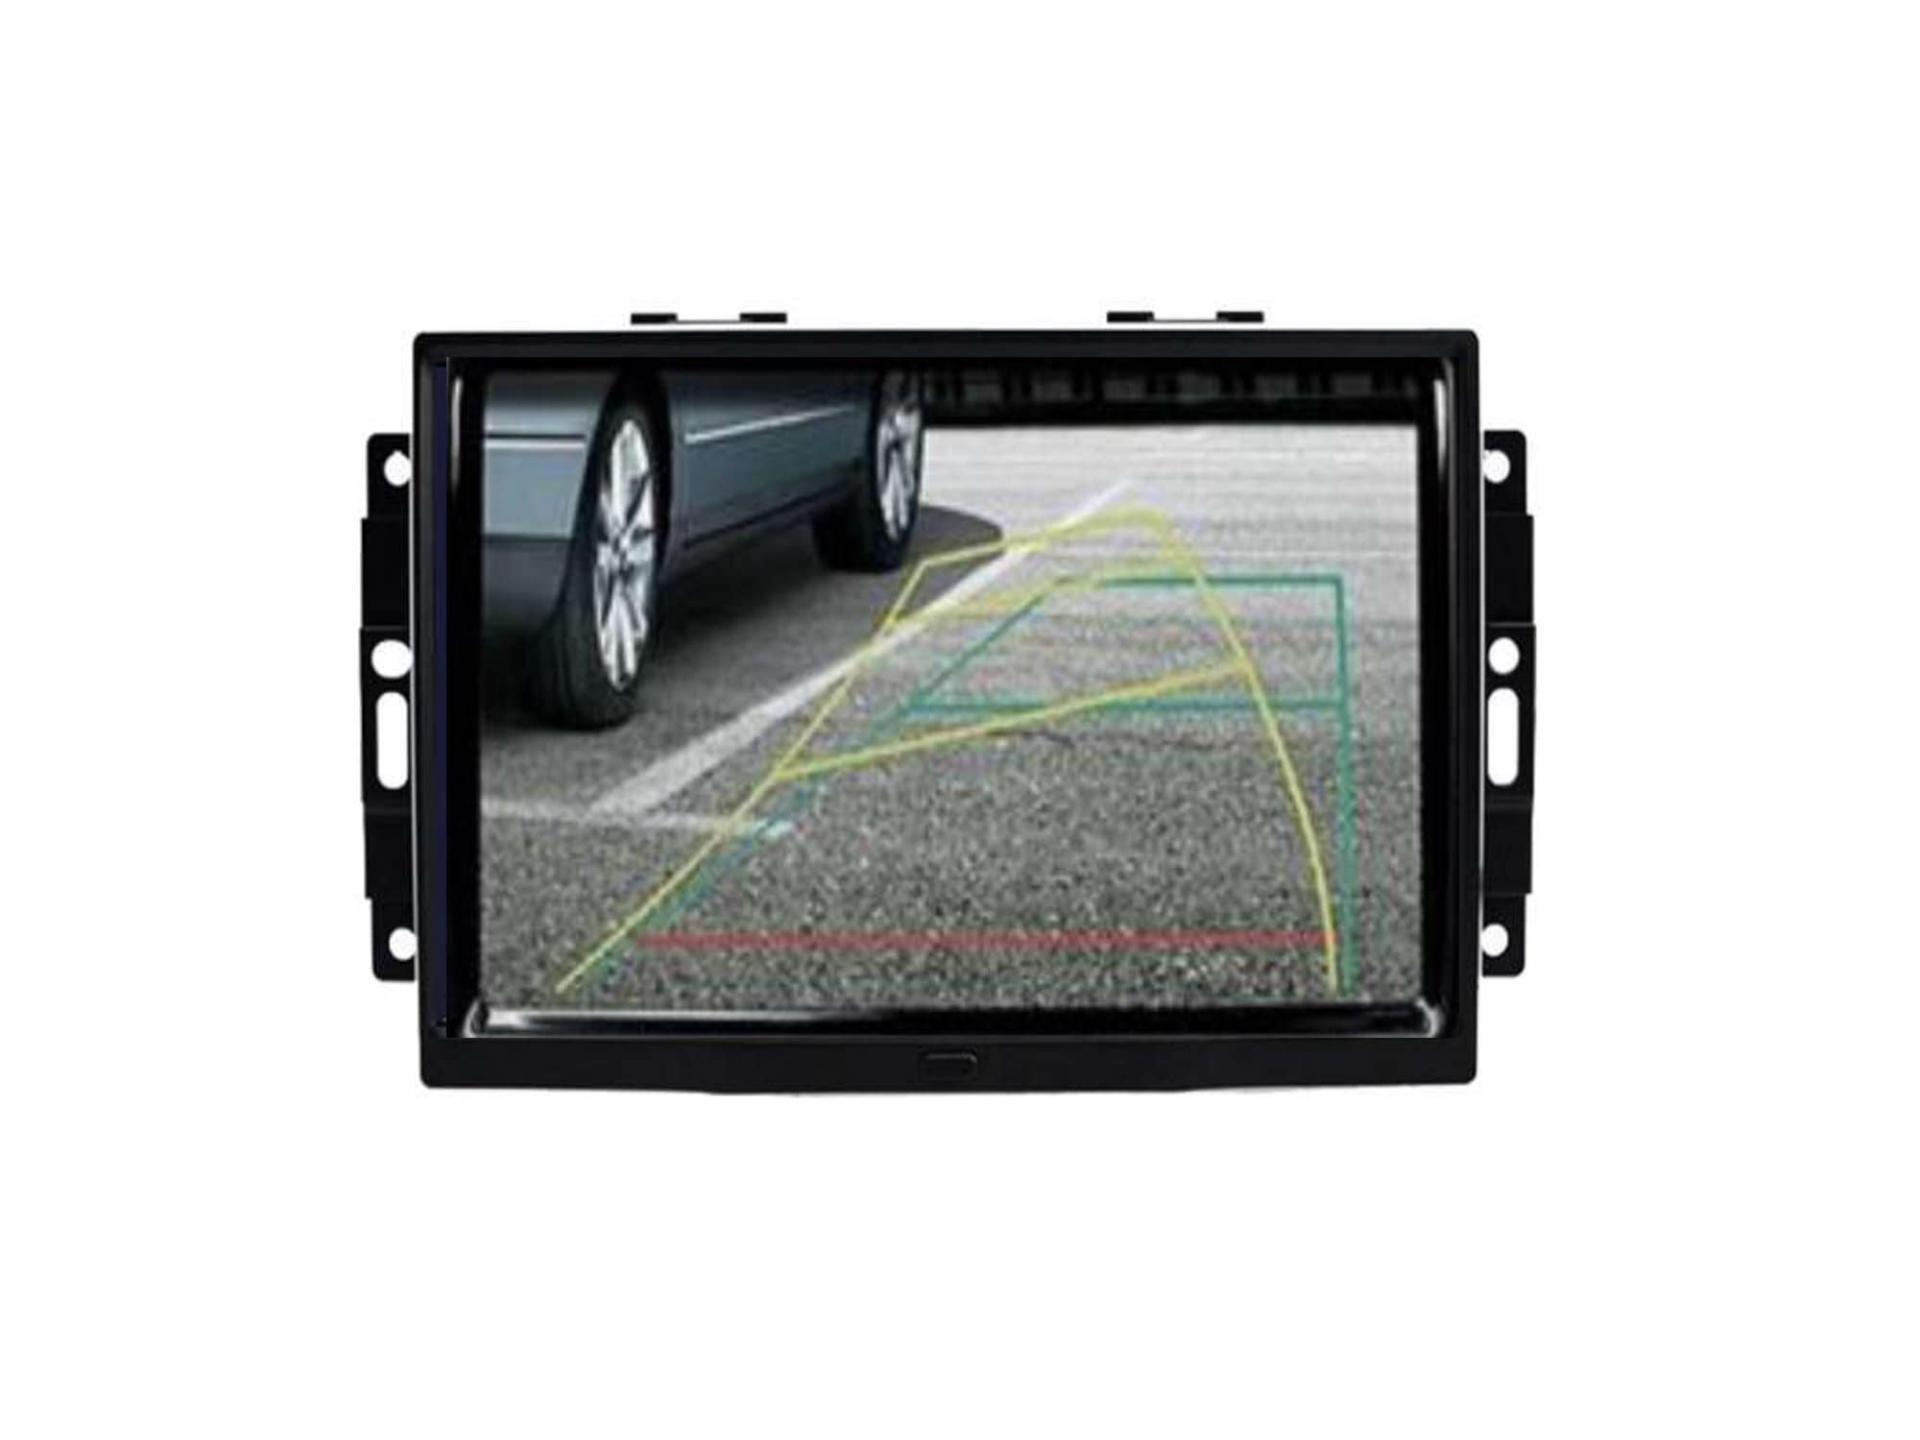 Autoradio gps carplay android auto bluetooth jeep chrysler 300c chrysler aspen remplace autoradio 2